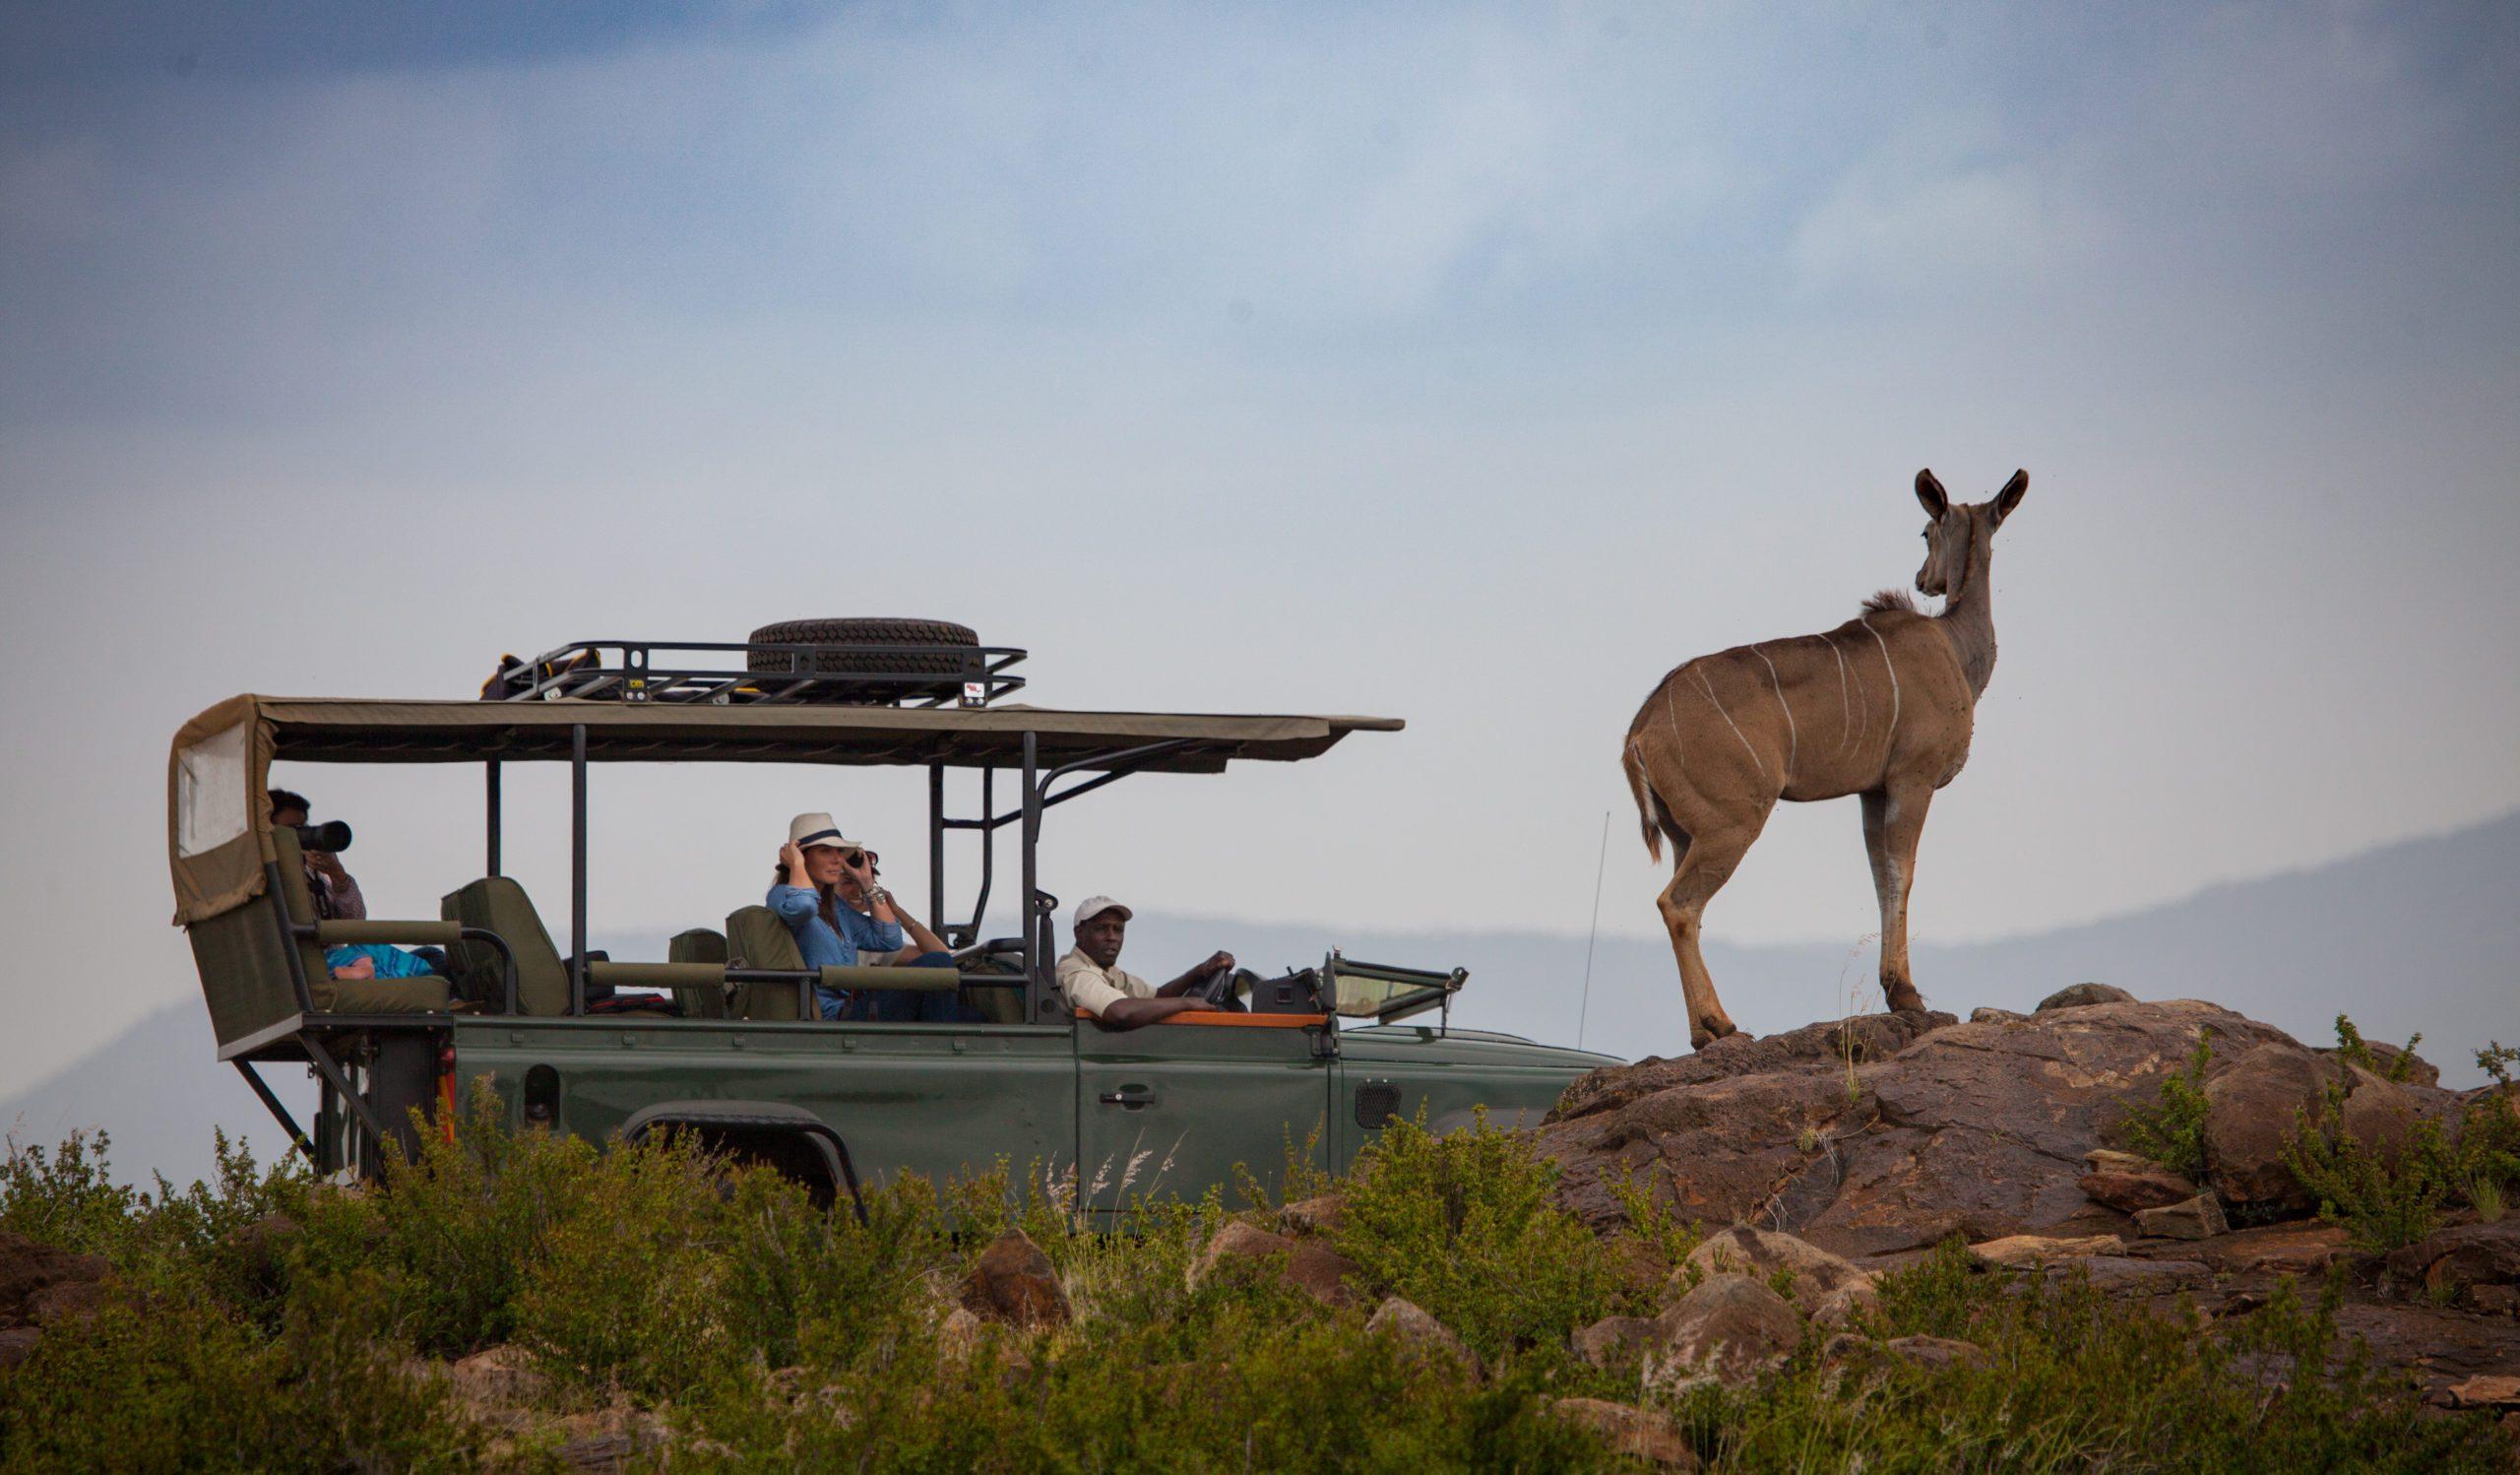 elewana loisaba tented camp luxury kenya safari vehicle observing an Eland